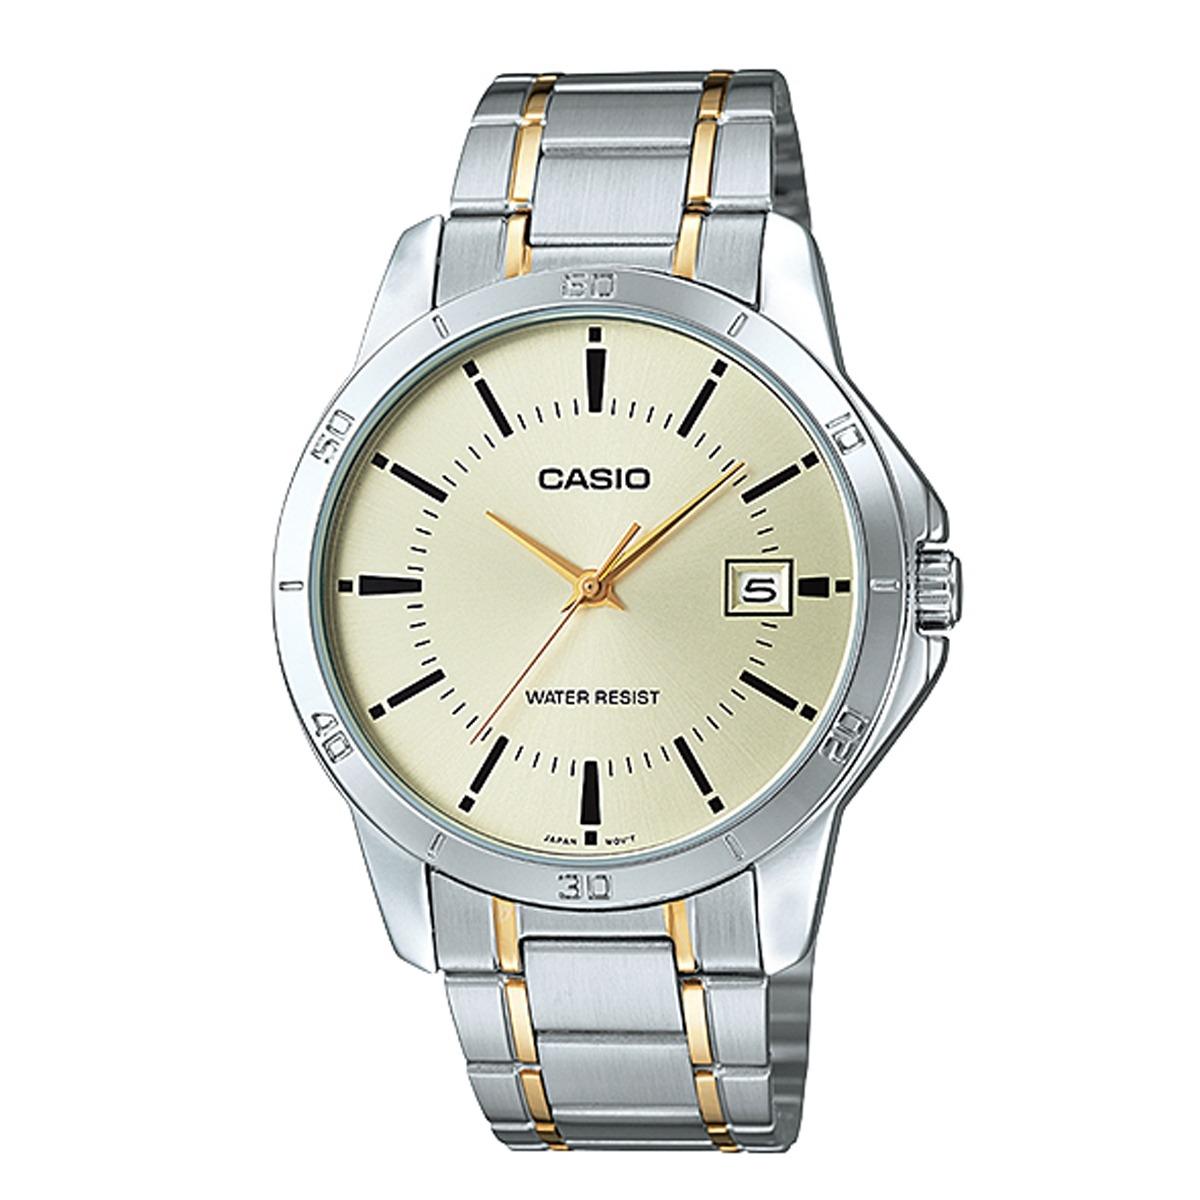 bb1941920d9 Relógio Casio Collection Analógico Masculino Mtp-v004sg-9aud - R ...